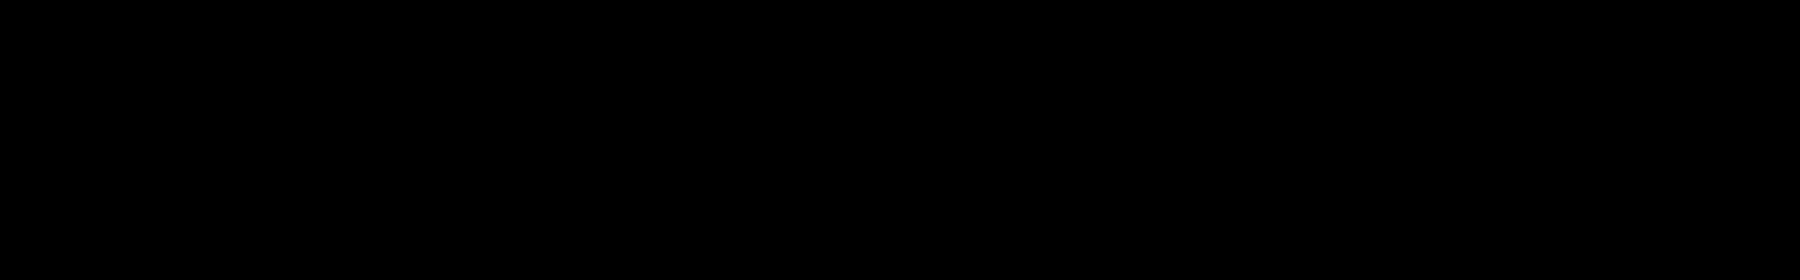 ANIMATOR FOR PRISM audio waveform